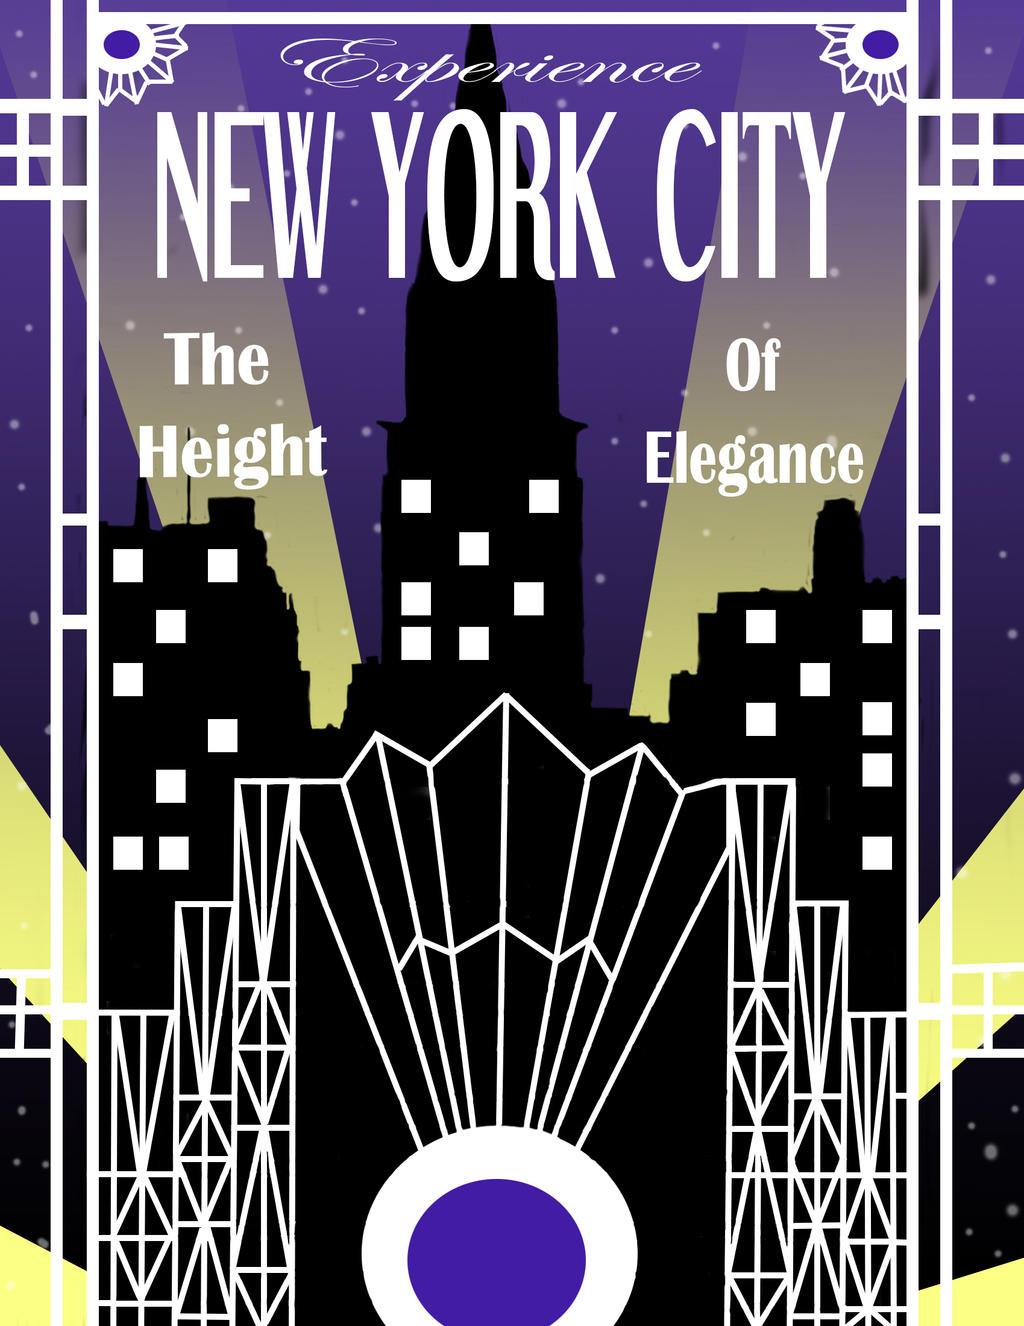 Art Deco Design New York City By JeanineWilder On DeviantART